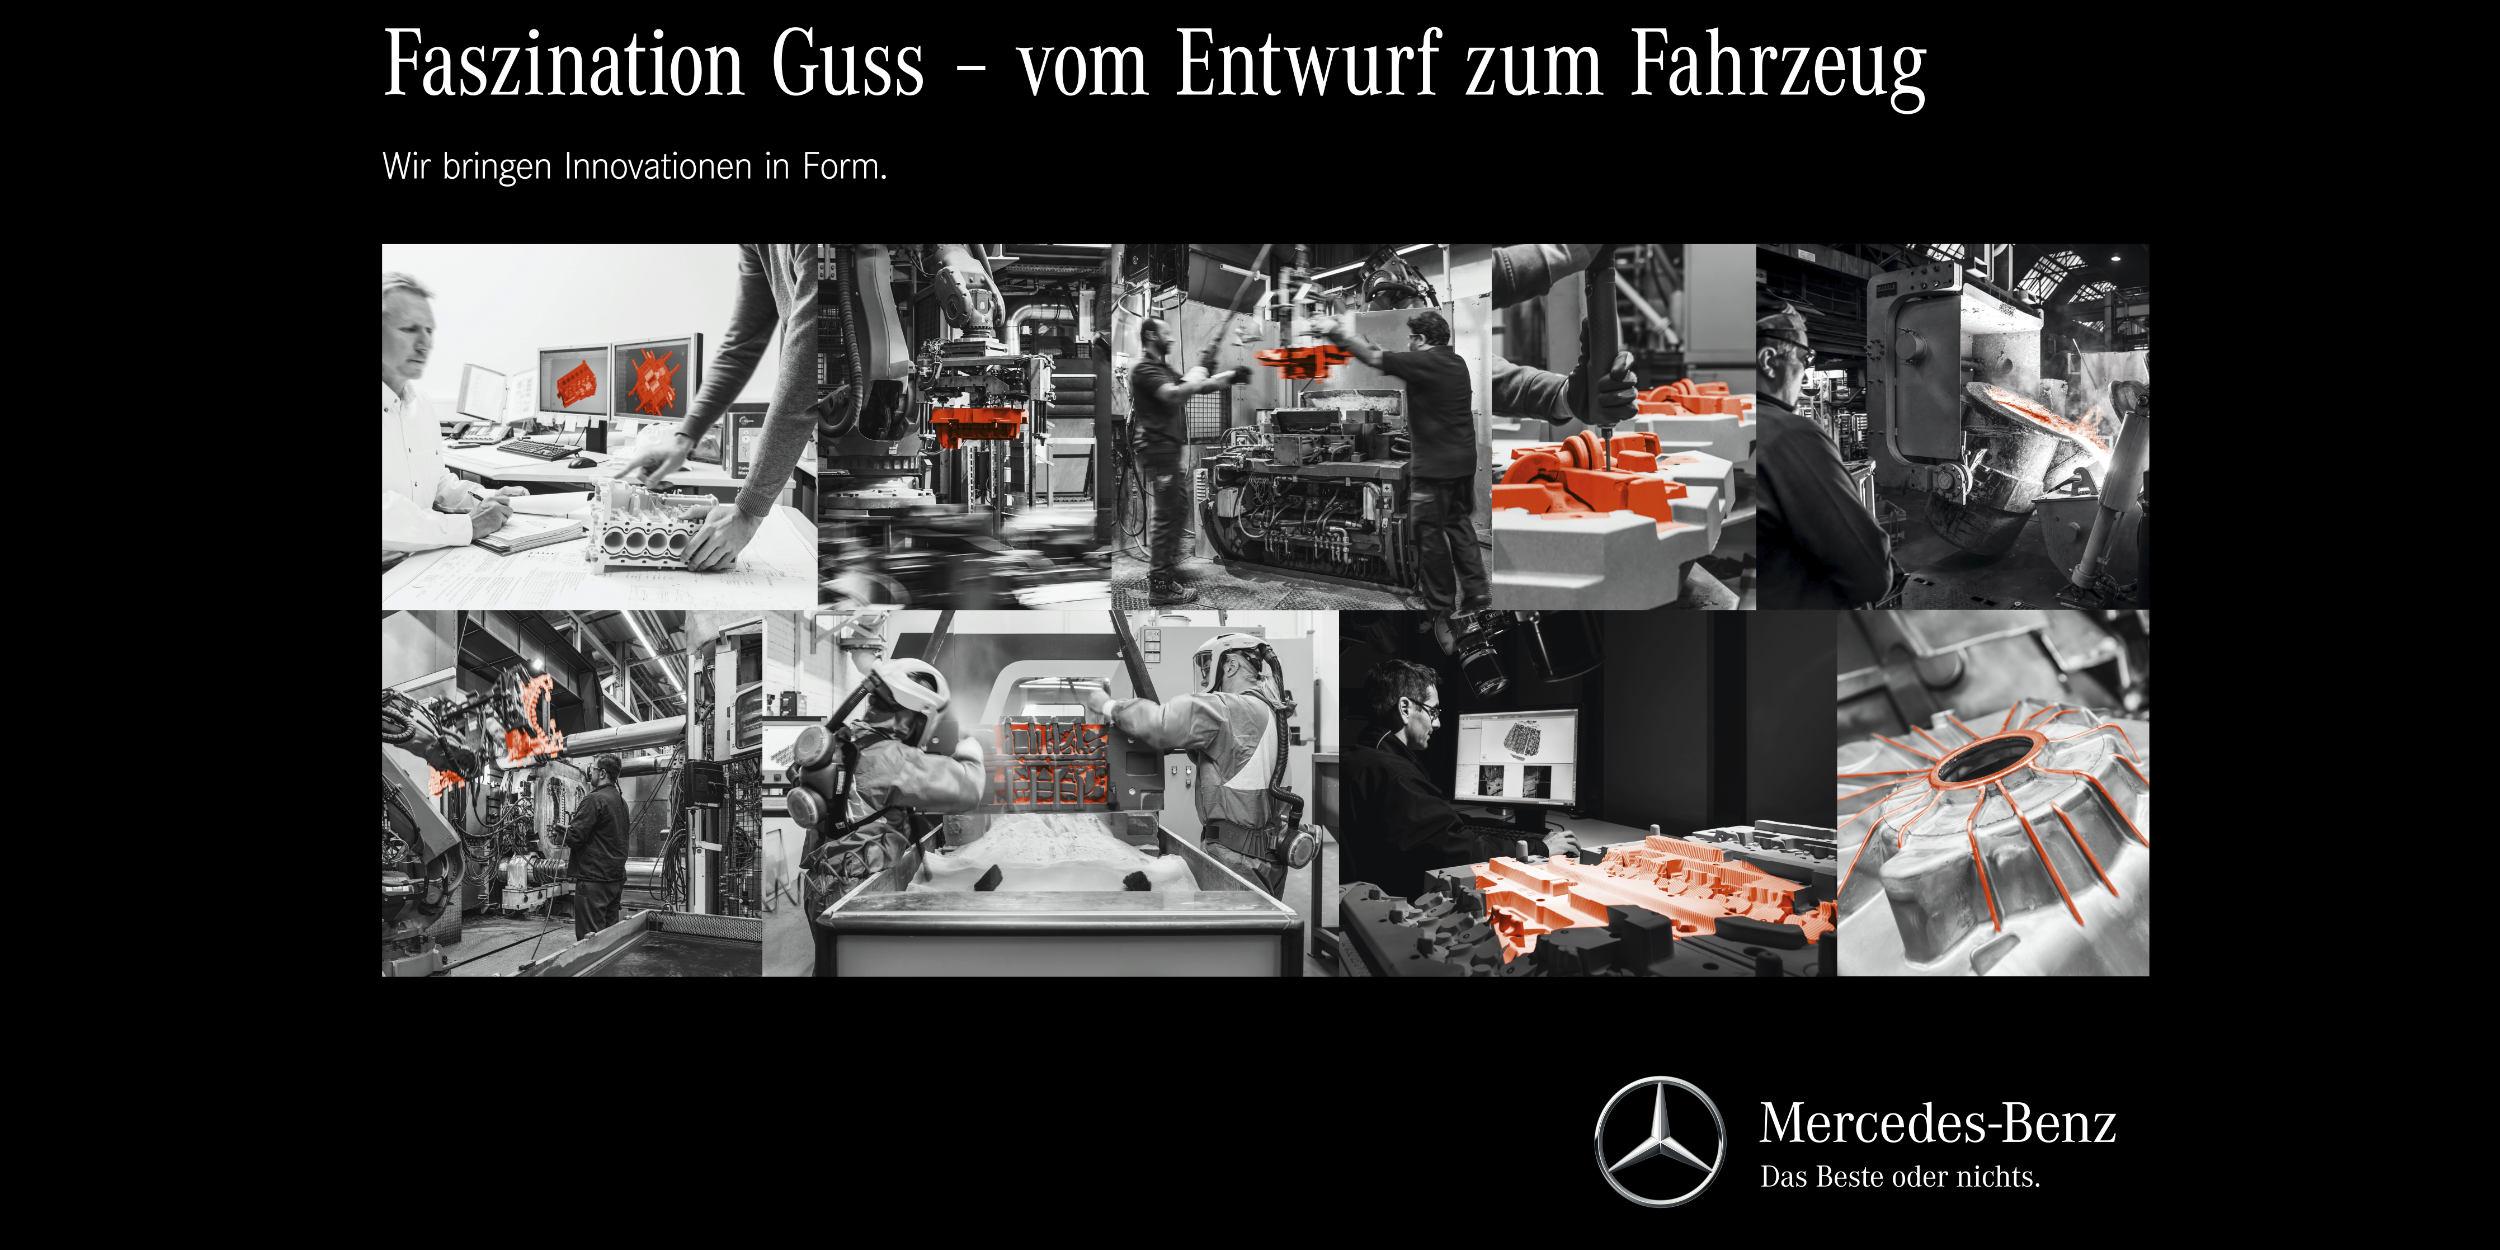 Industriefotografie Stuttgart und Umgebung Kampagnenflyer Mercedes Benz PTU-DT Schwarz Weiss Faszination Guss